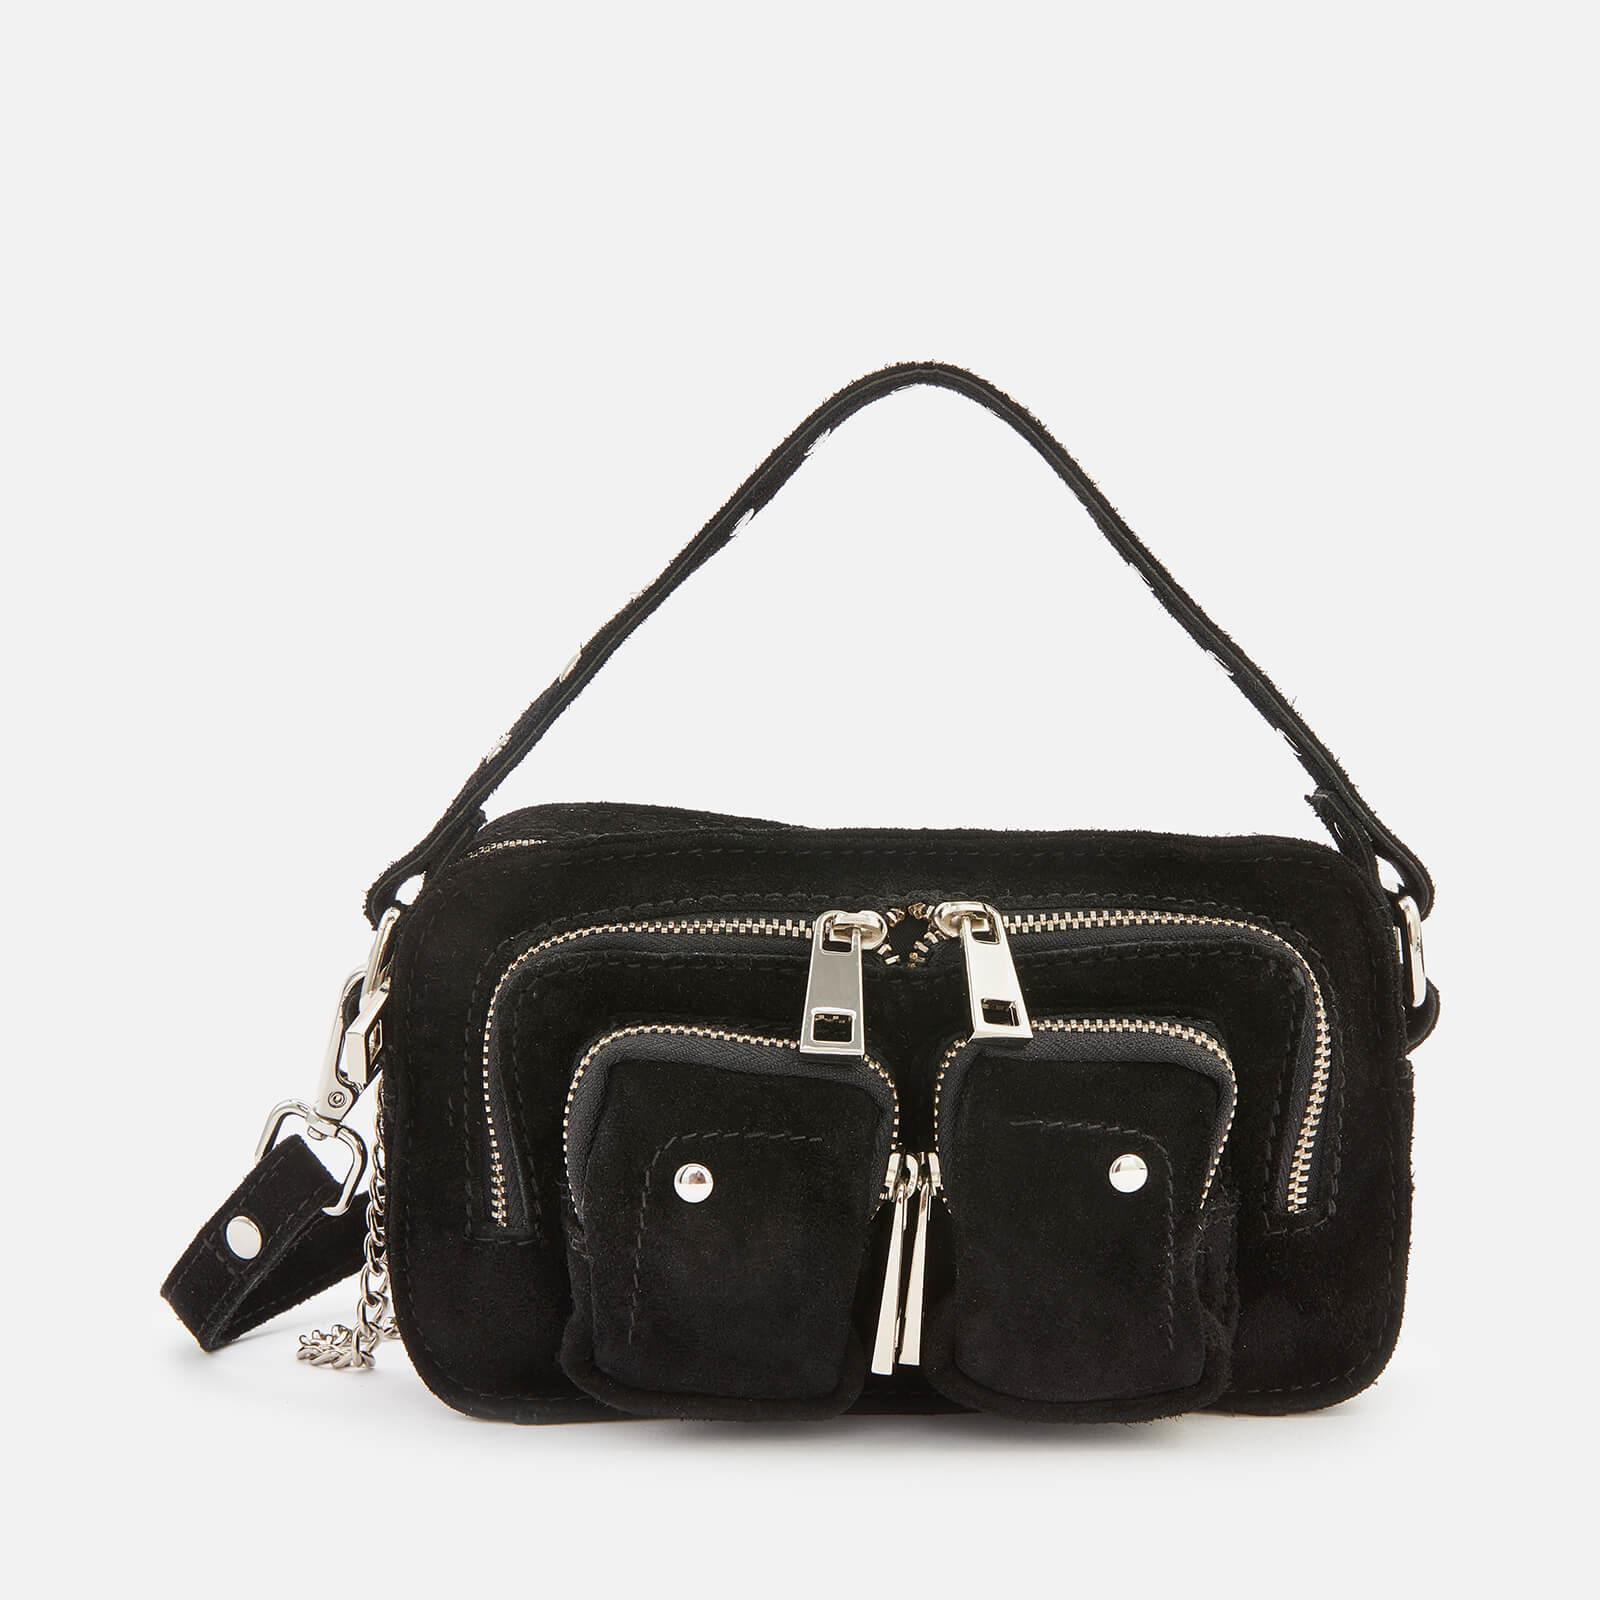 Núnoo Women's Helena New Suede Cross Body Bag - Black